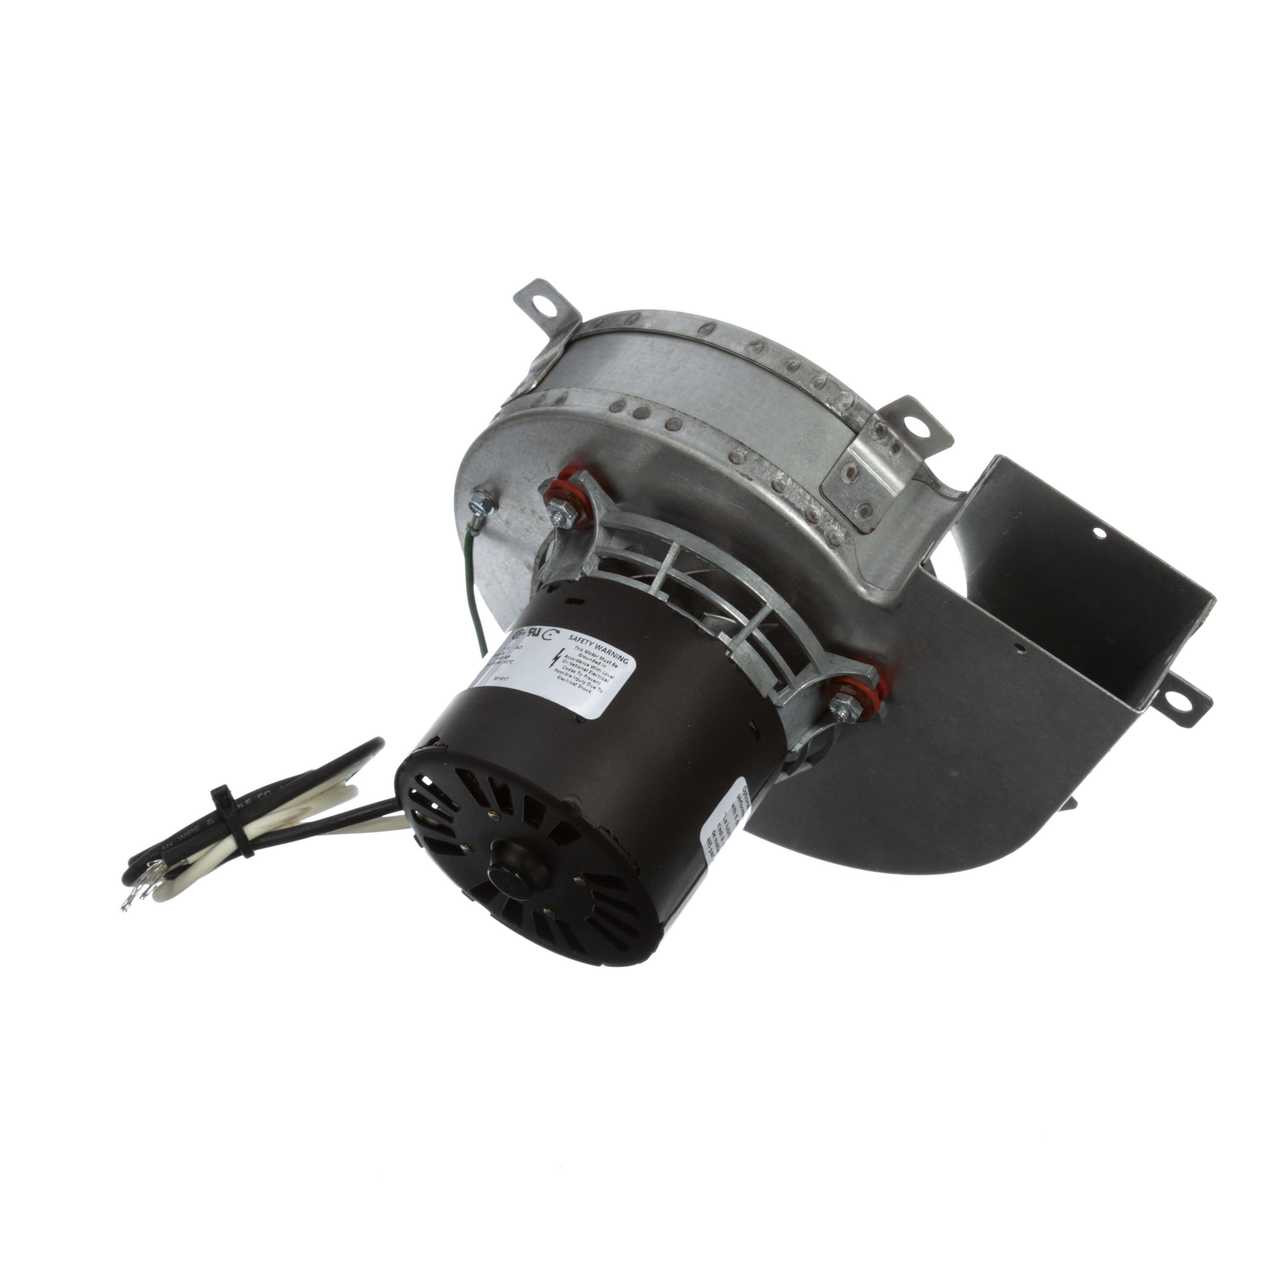 Goodman Furnace Draft Inducer Blower 115v  7021